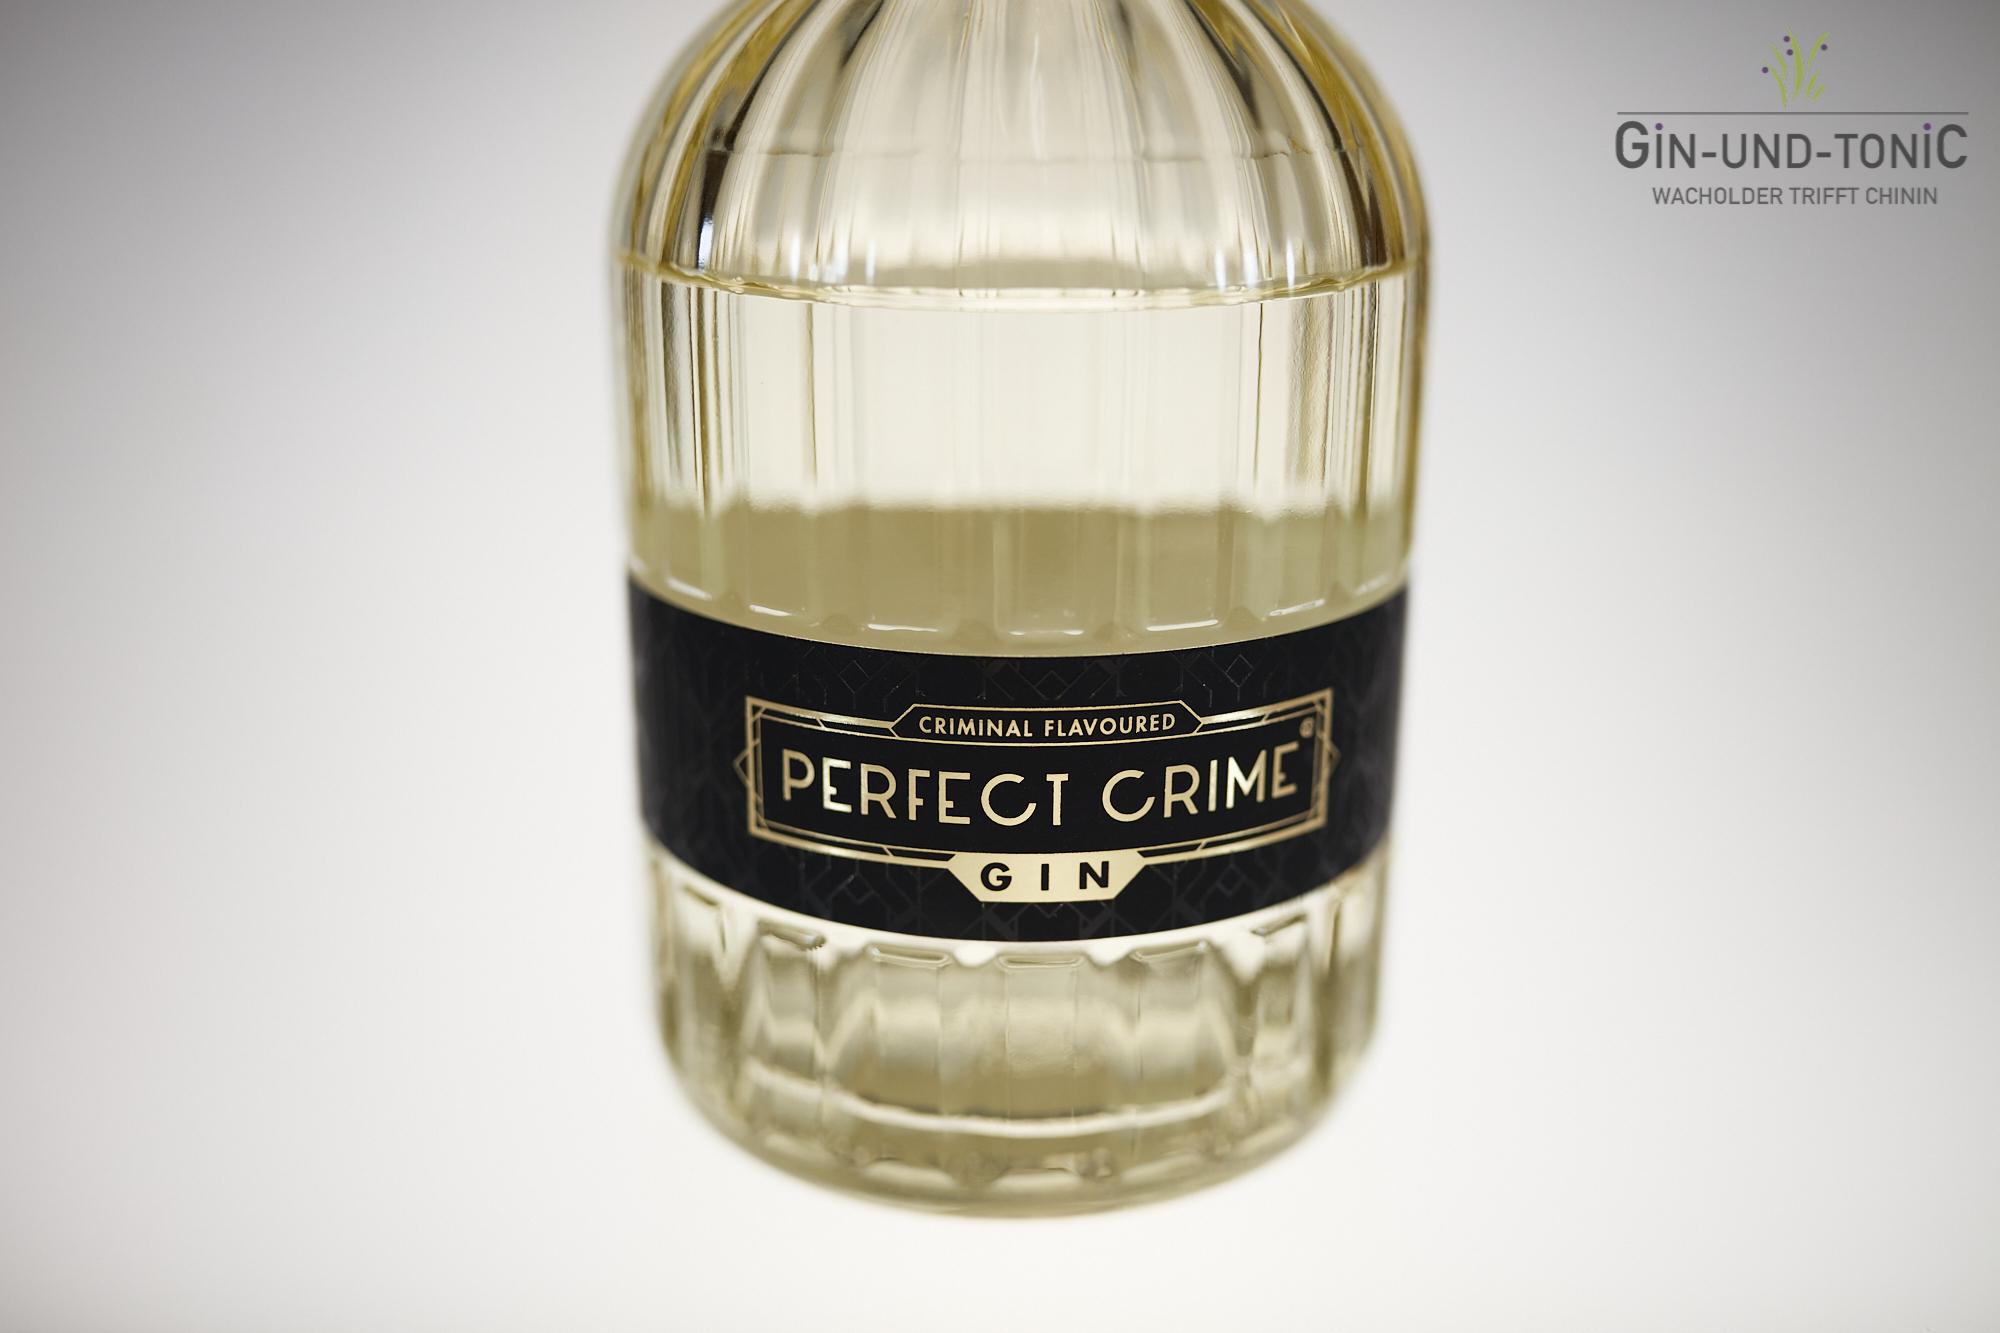 Perfect Crime Gin